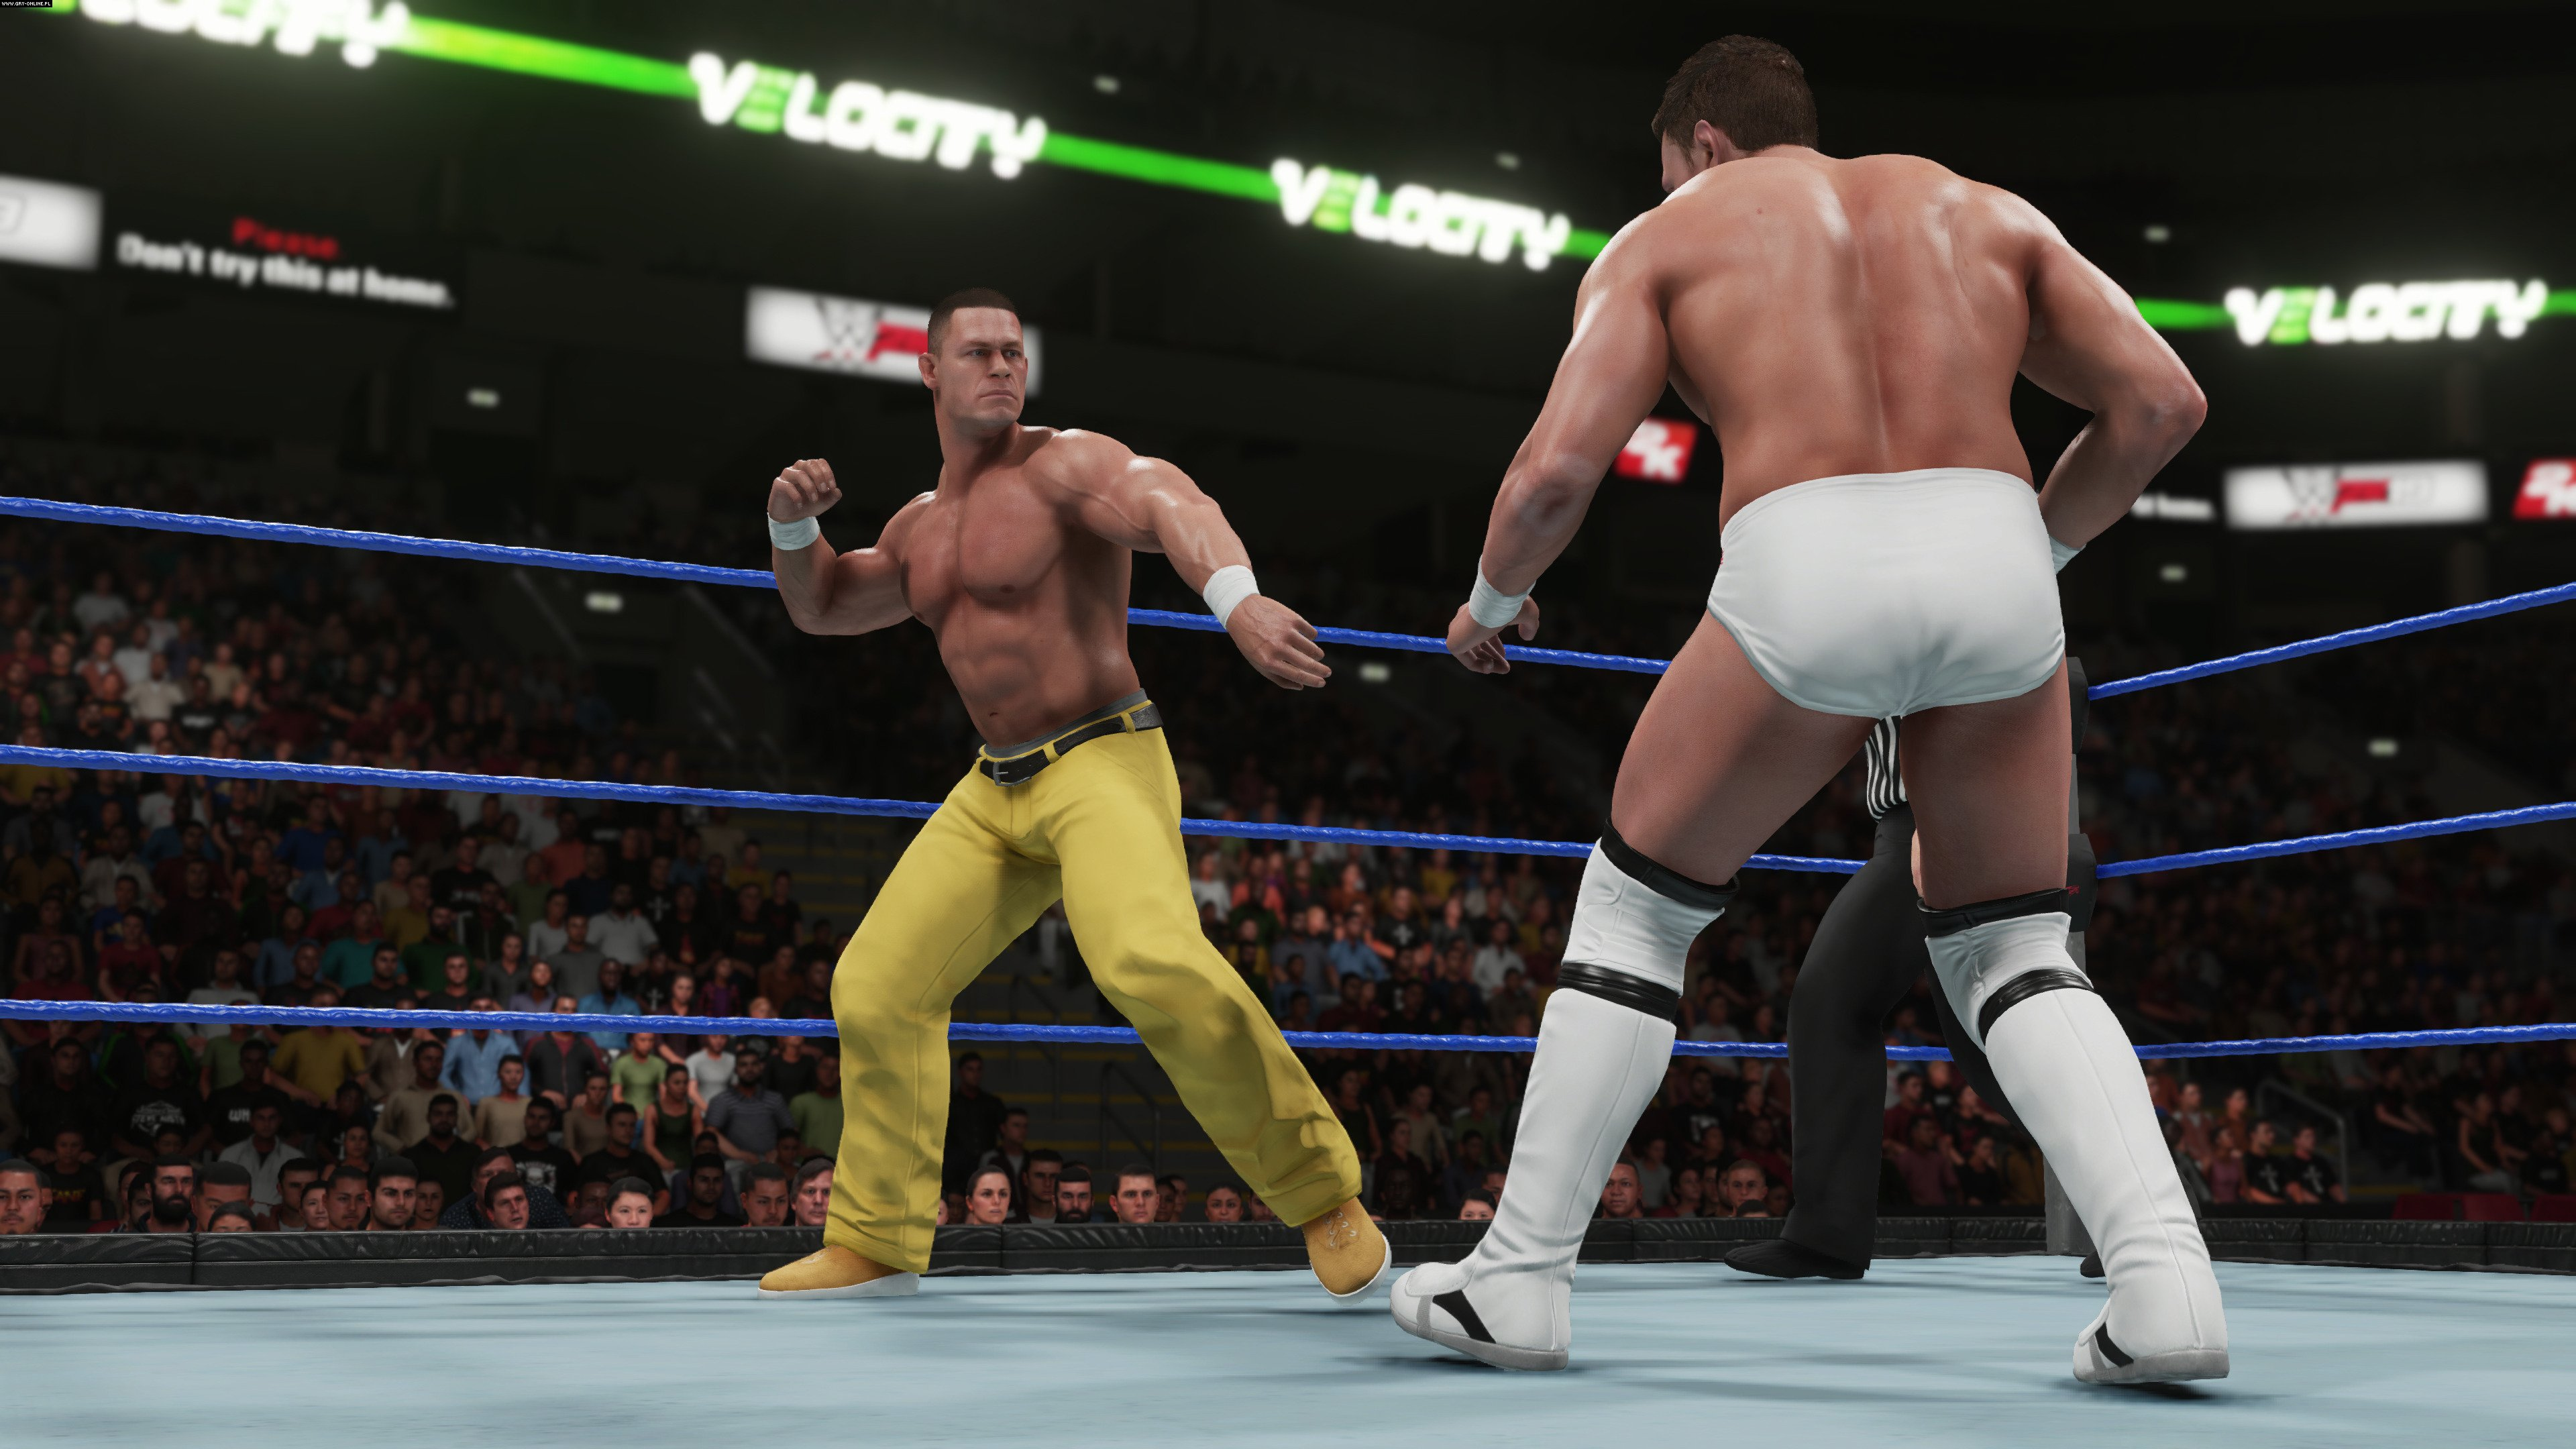 WWE 2K19 PC, PS4, XONE Games Image 2/8, Yuke's, 2K Games